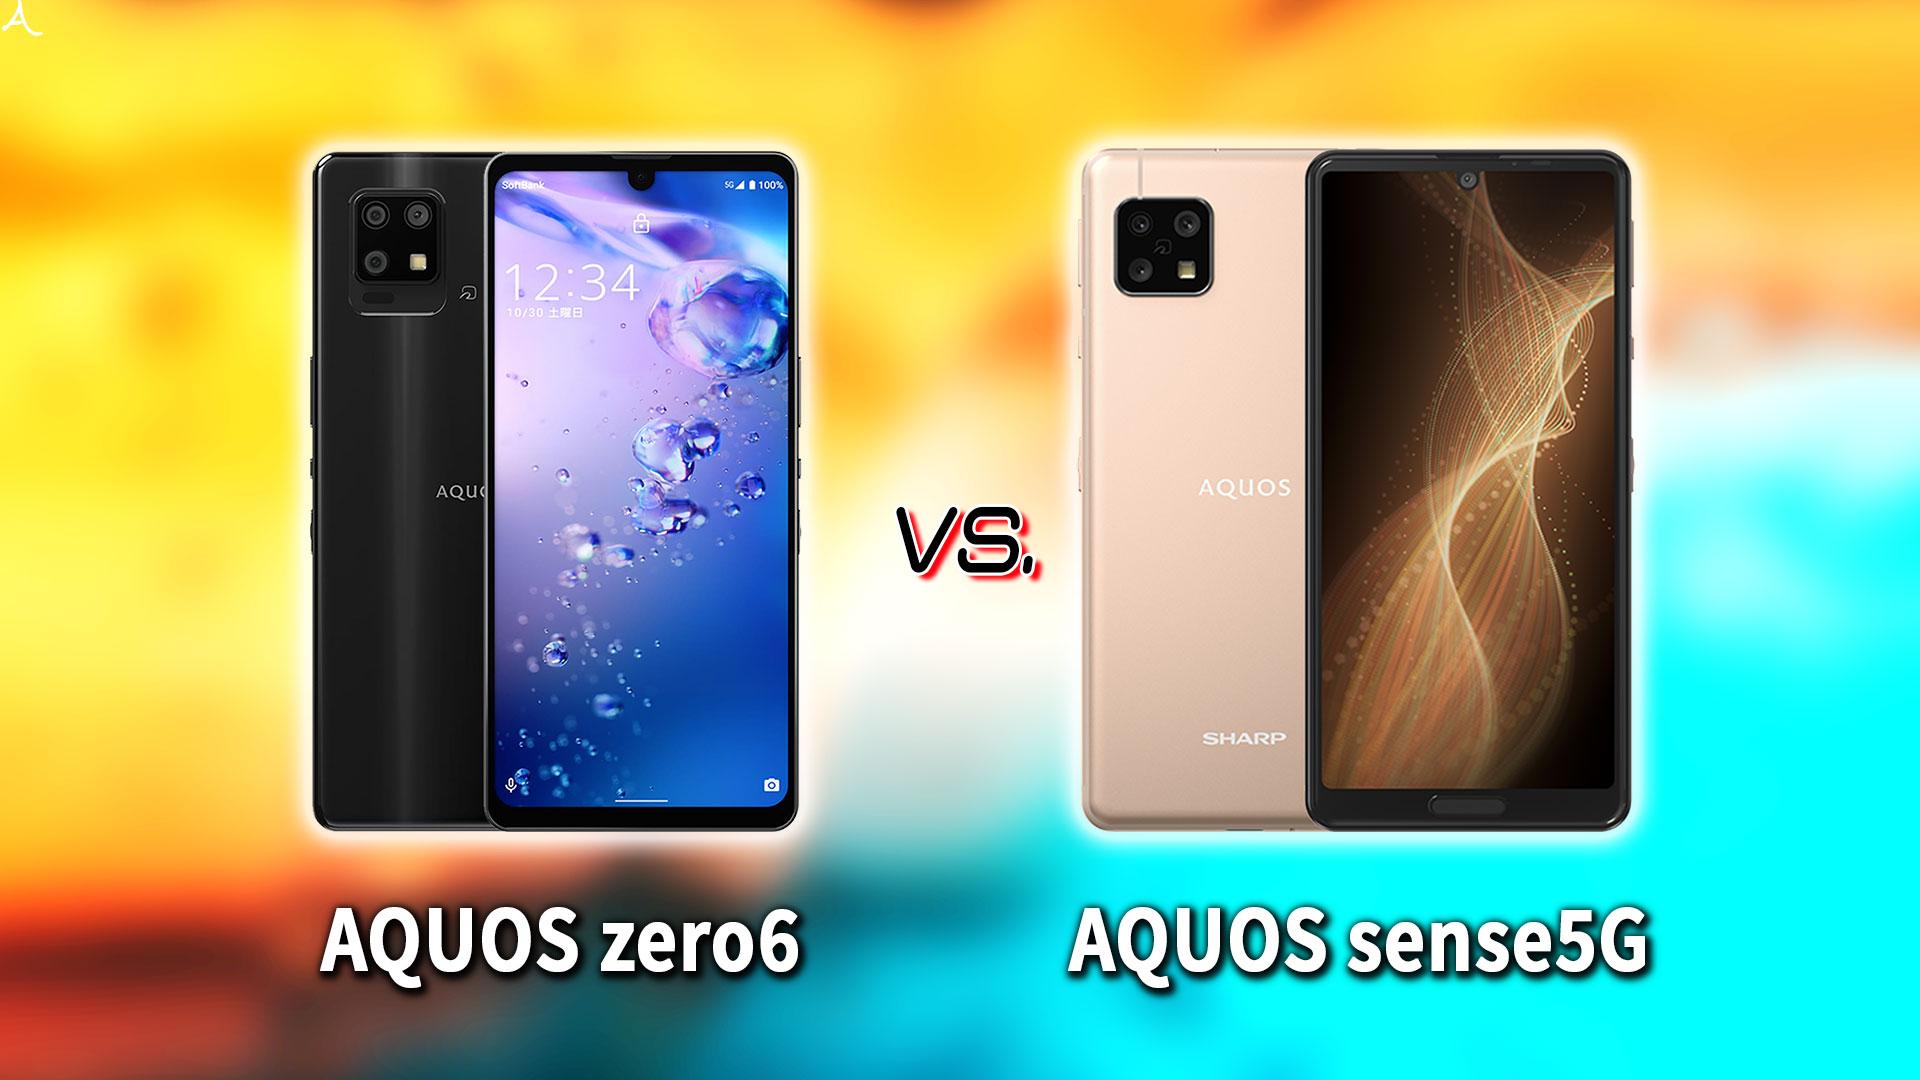 「AQUOS zero6」と「AQUOS sense5G」の違いを比較:どっちを買う?